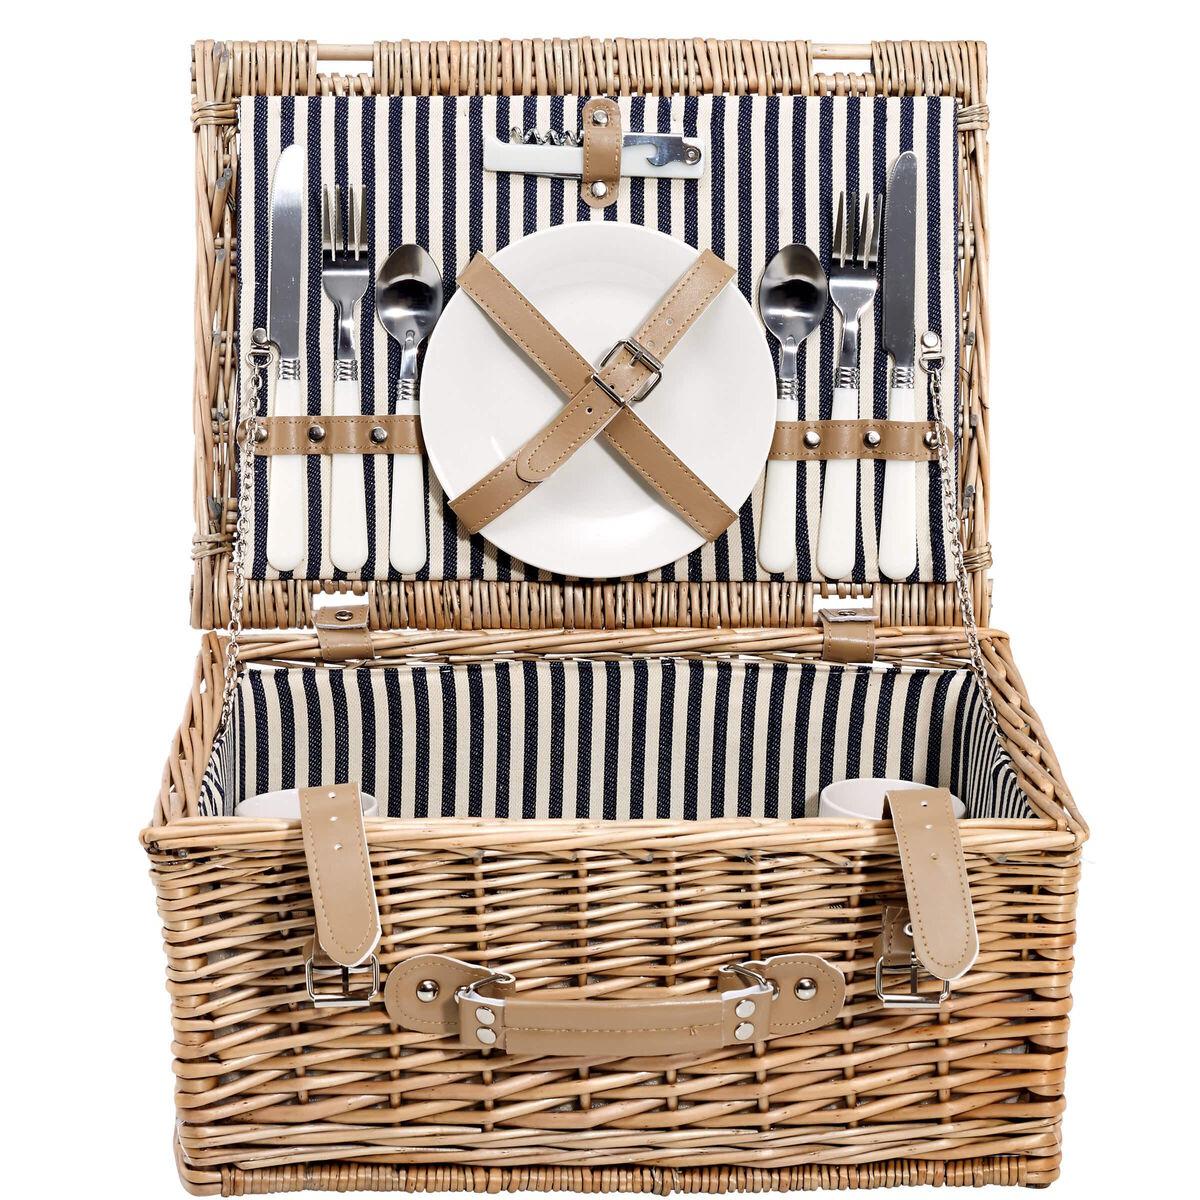 a day in the park picknickkorb f r 2 personen butlers. Black Bedroom Furniture Sets. Home Design Ideas